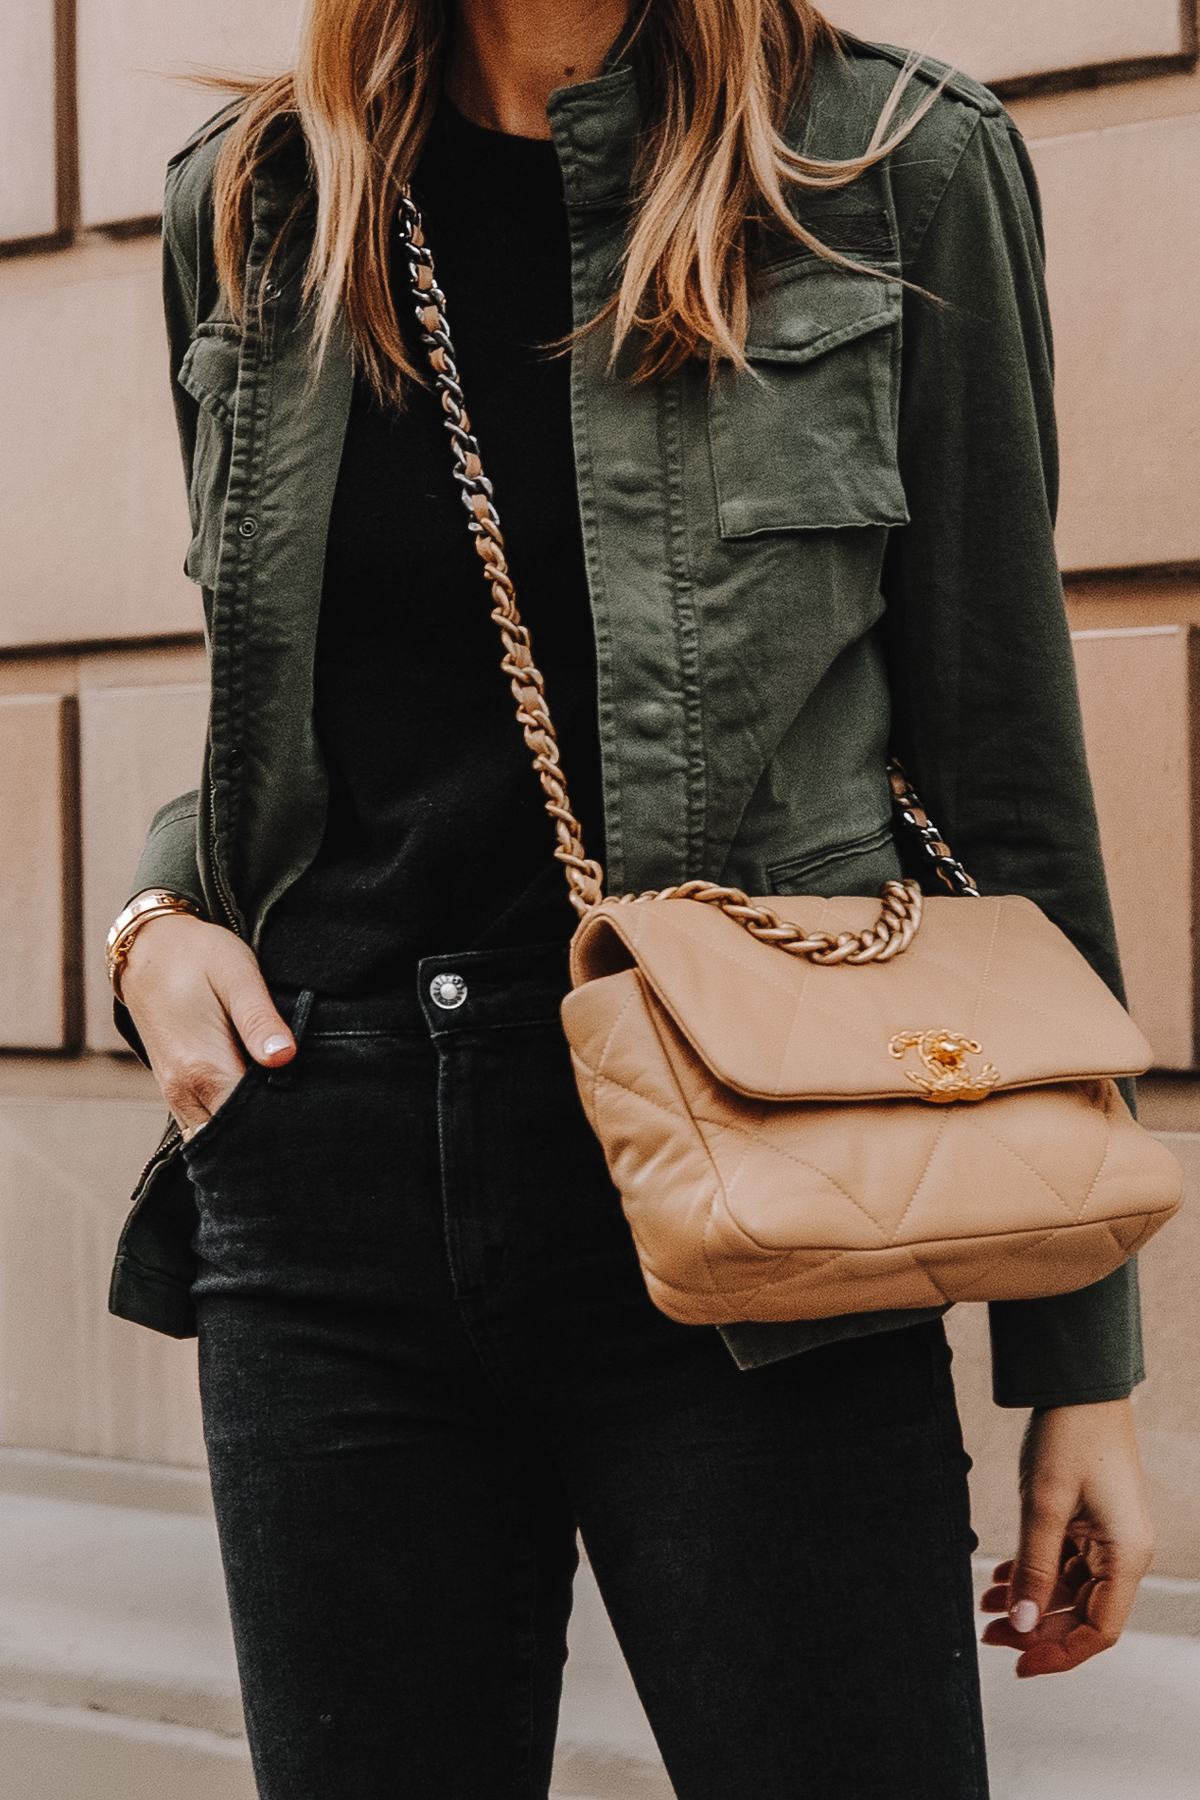 Fashion Jackson Wearing Anine Bing Green Utility Jacket Chanel 19 Small Dark Beige Handbag 3